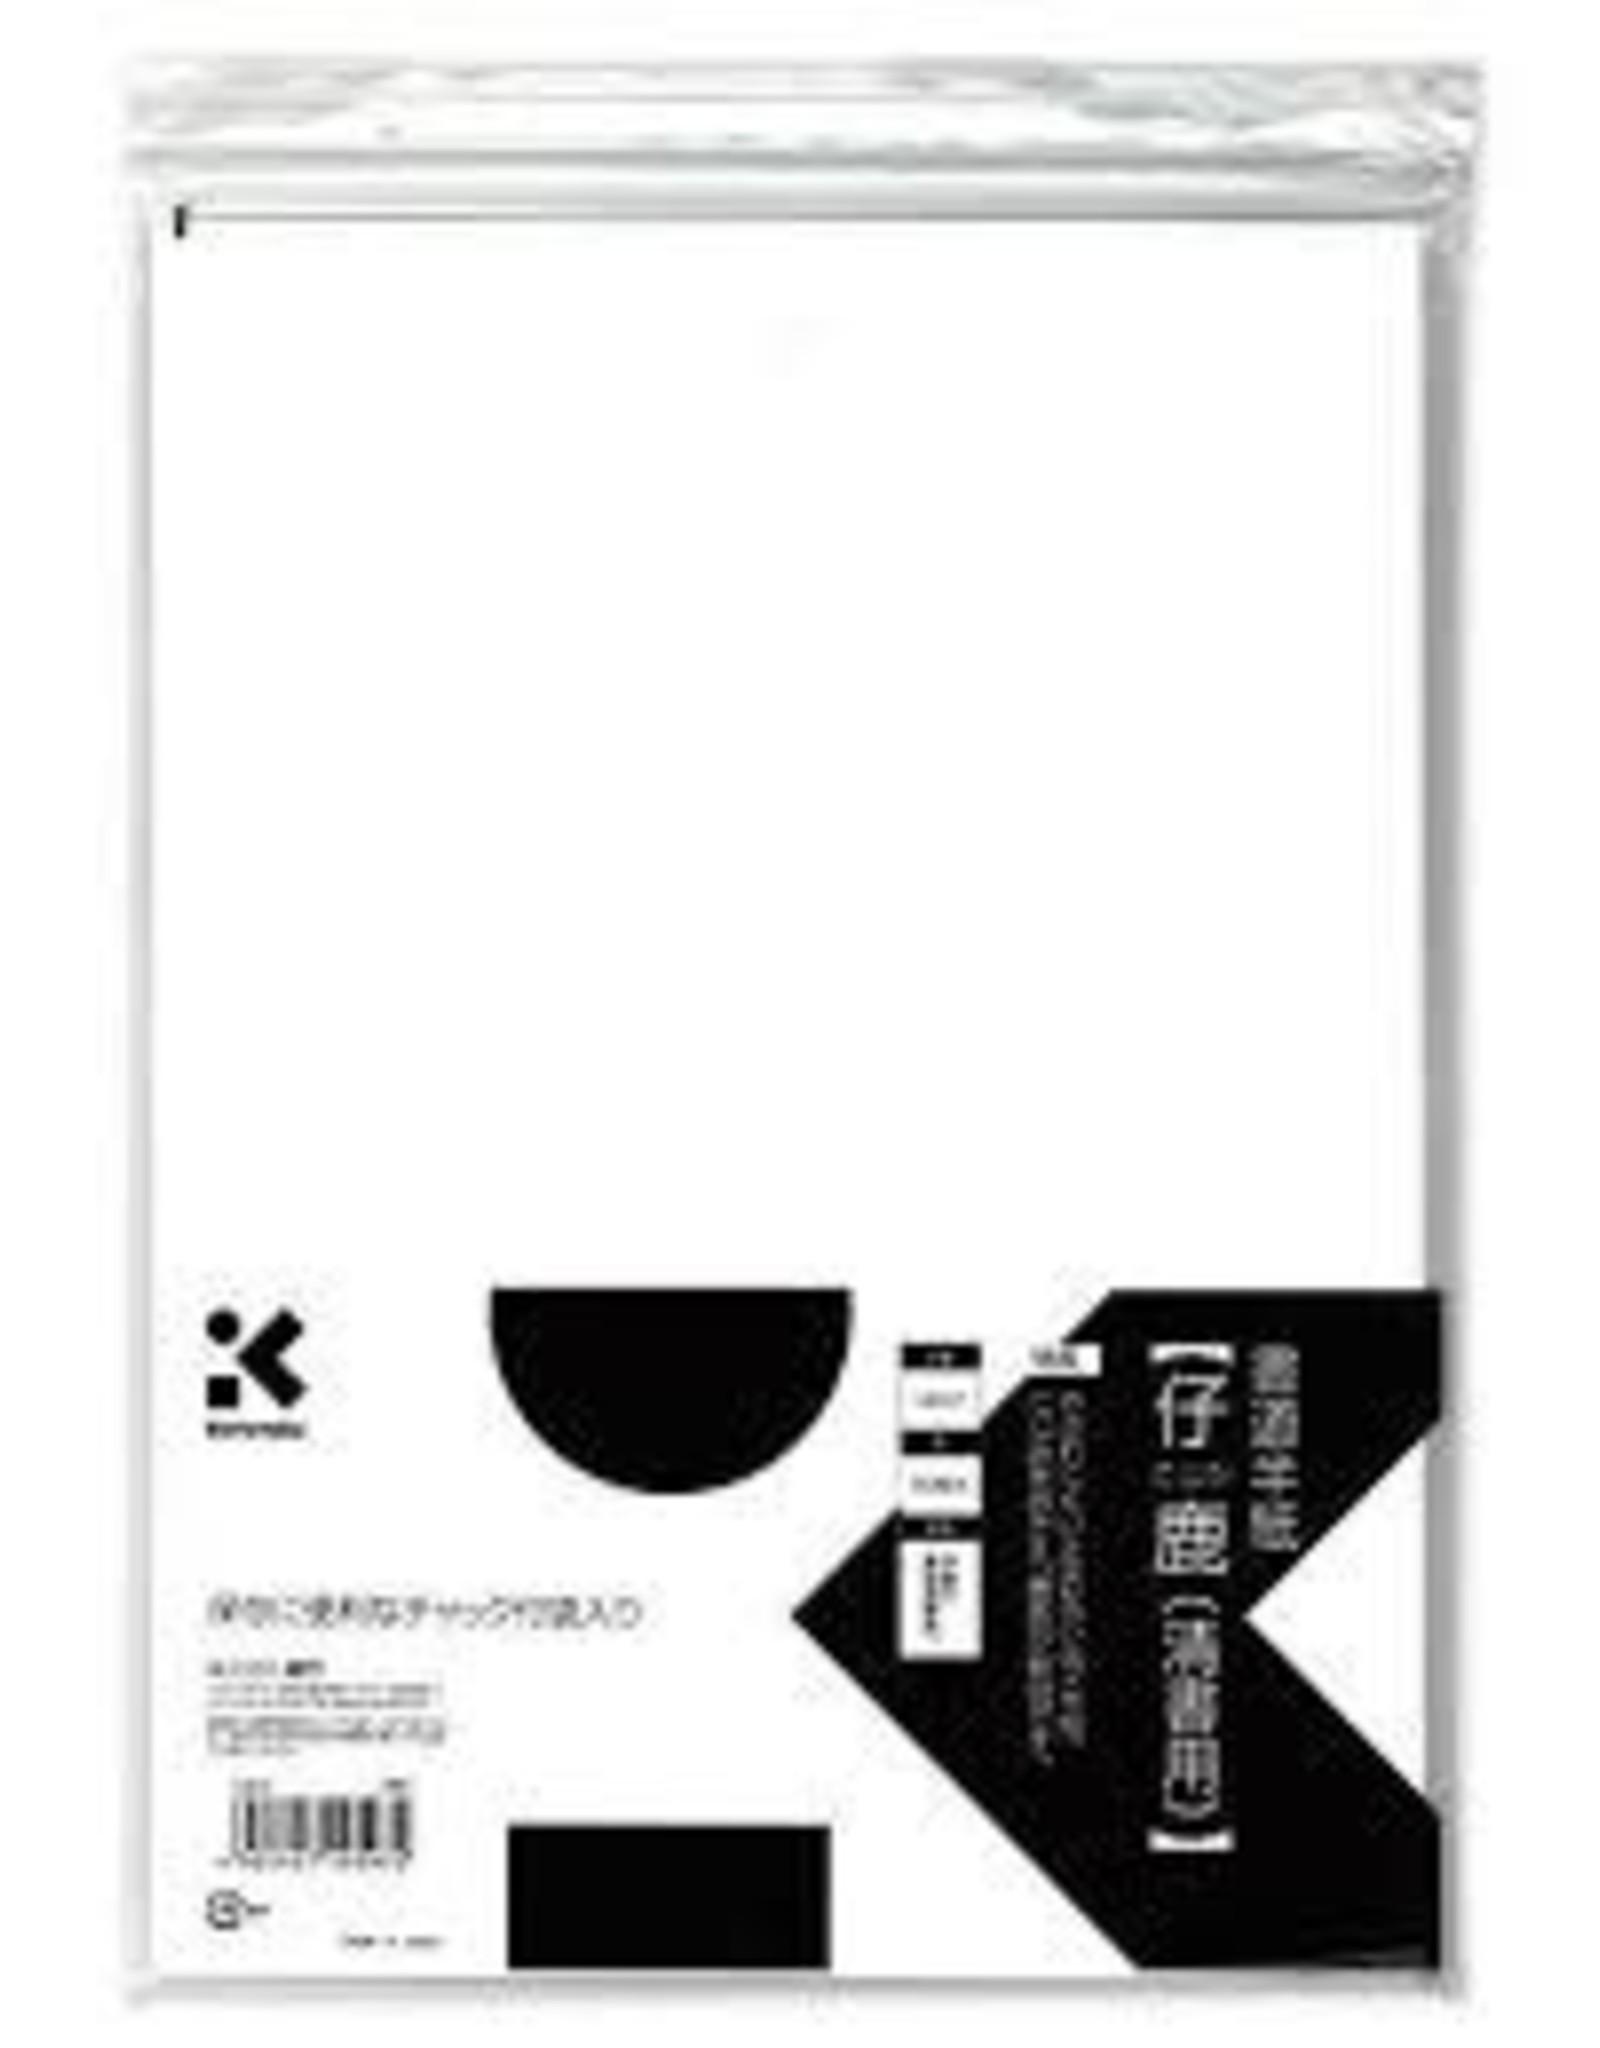 Kuretake Co., Ltd. CALLIGRAPHY PAPER